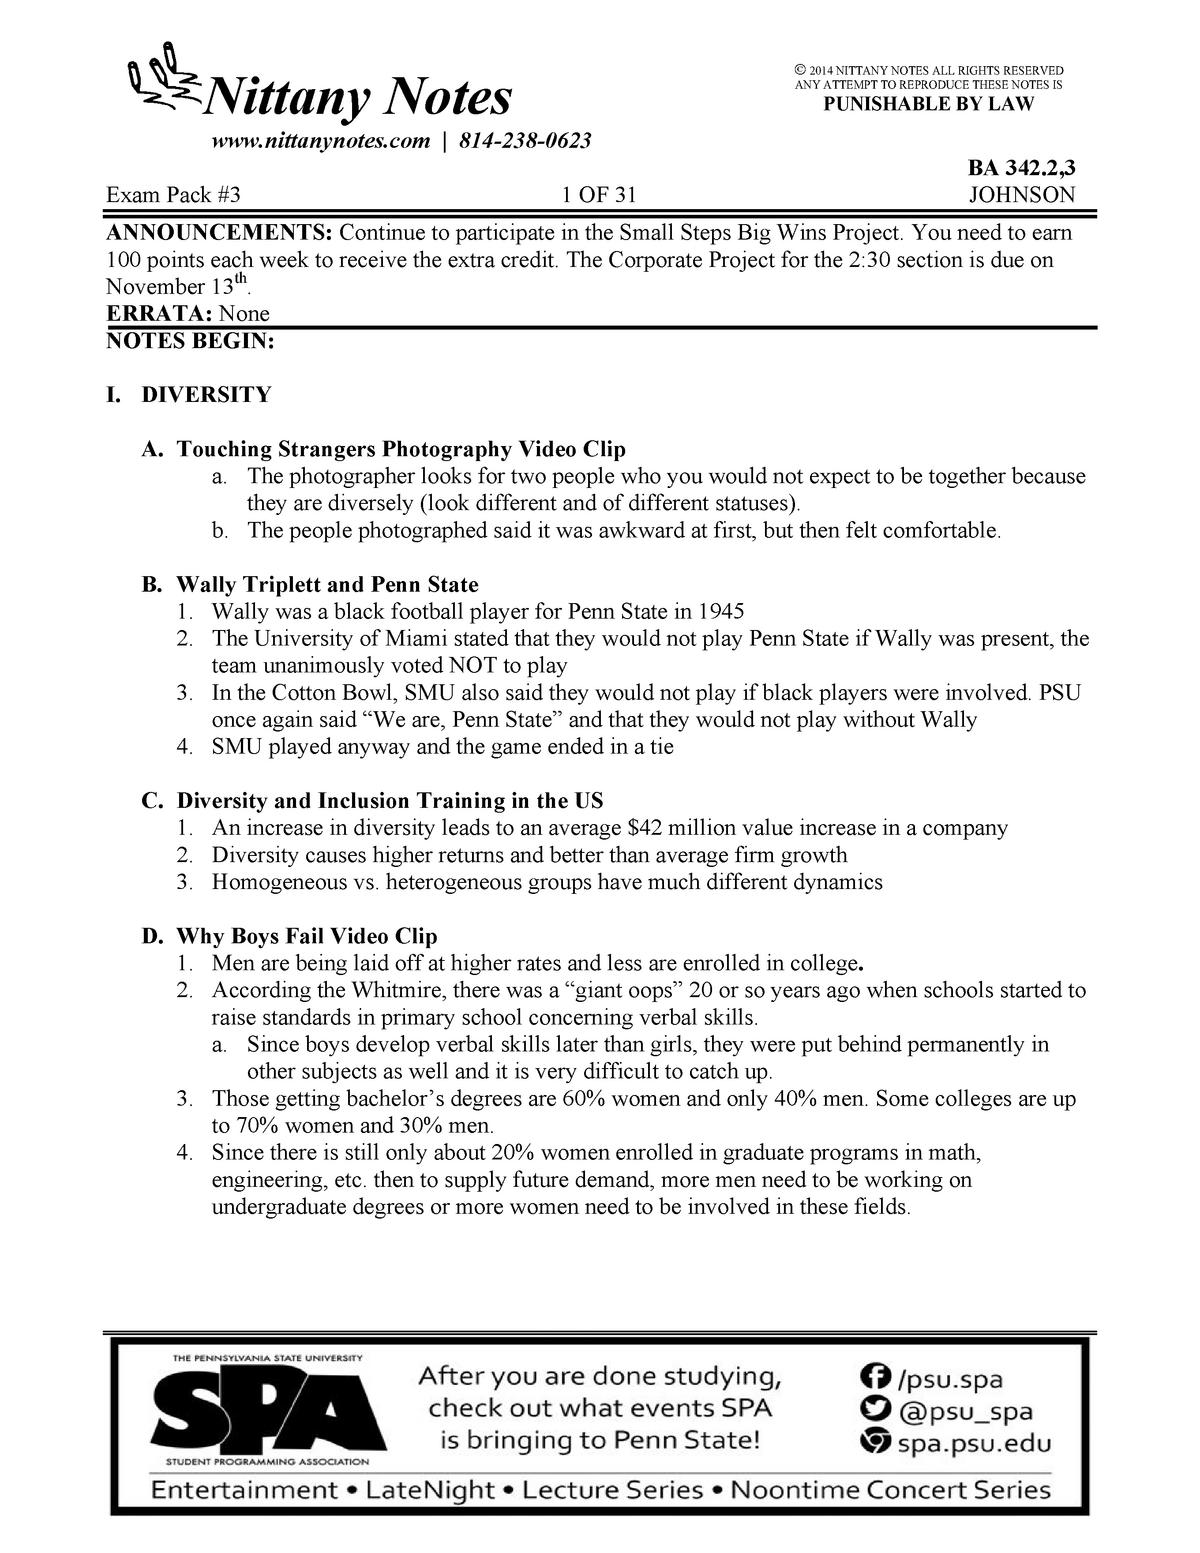 BA 342 Study Guide EXAM #2 - 342 B A - Penn State - StuDocu